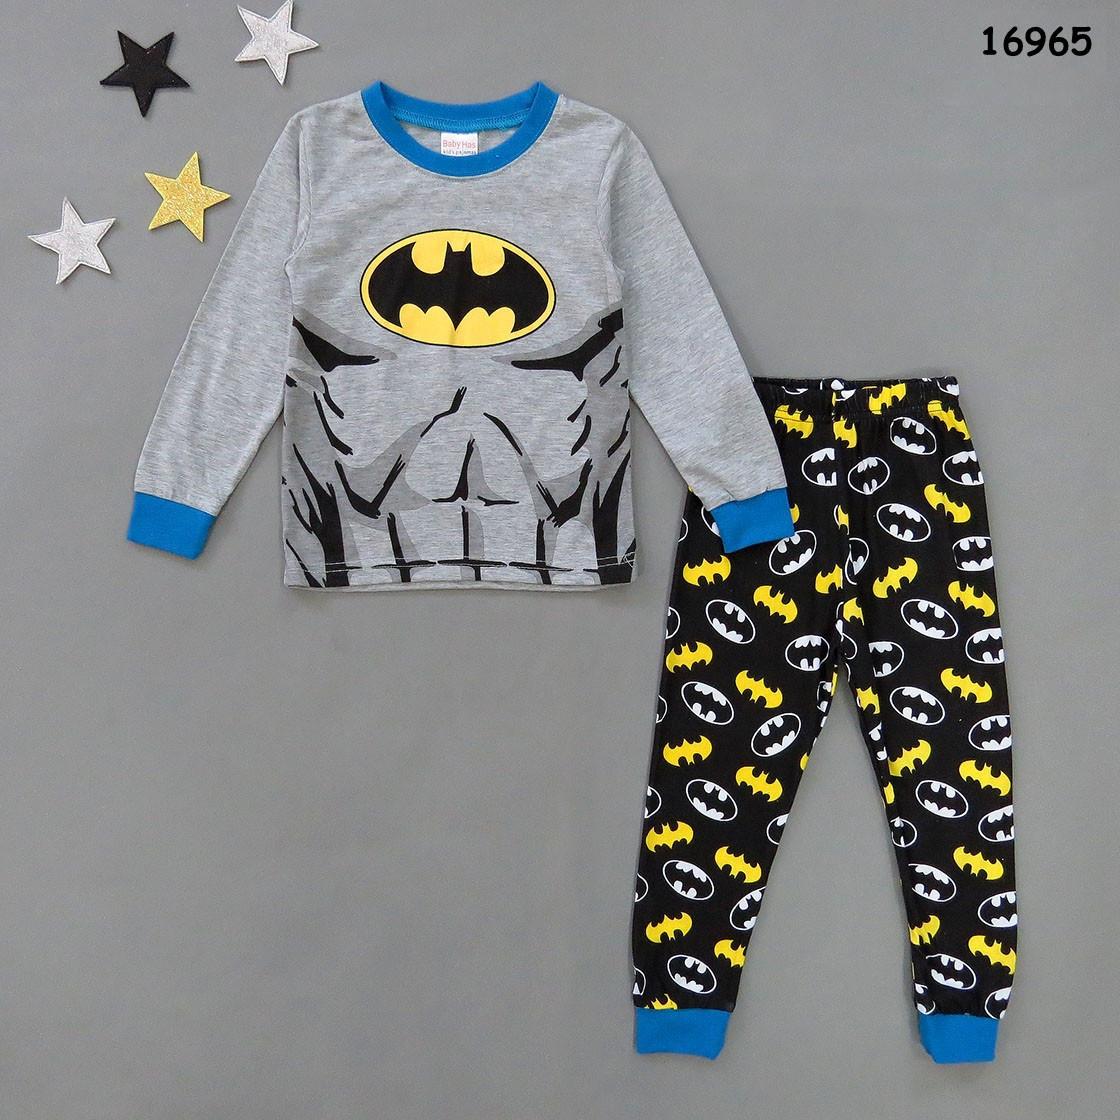 Пижама Batman для мальчика. 4 46eb2ad703e6a